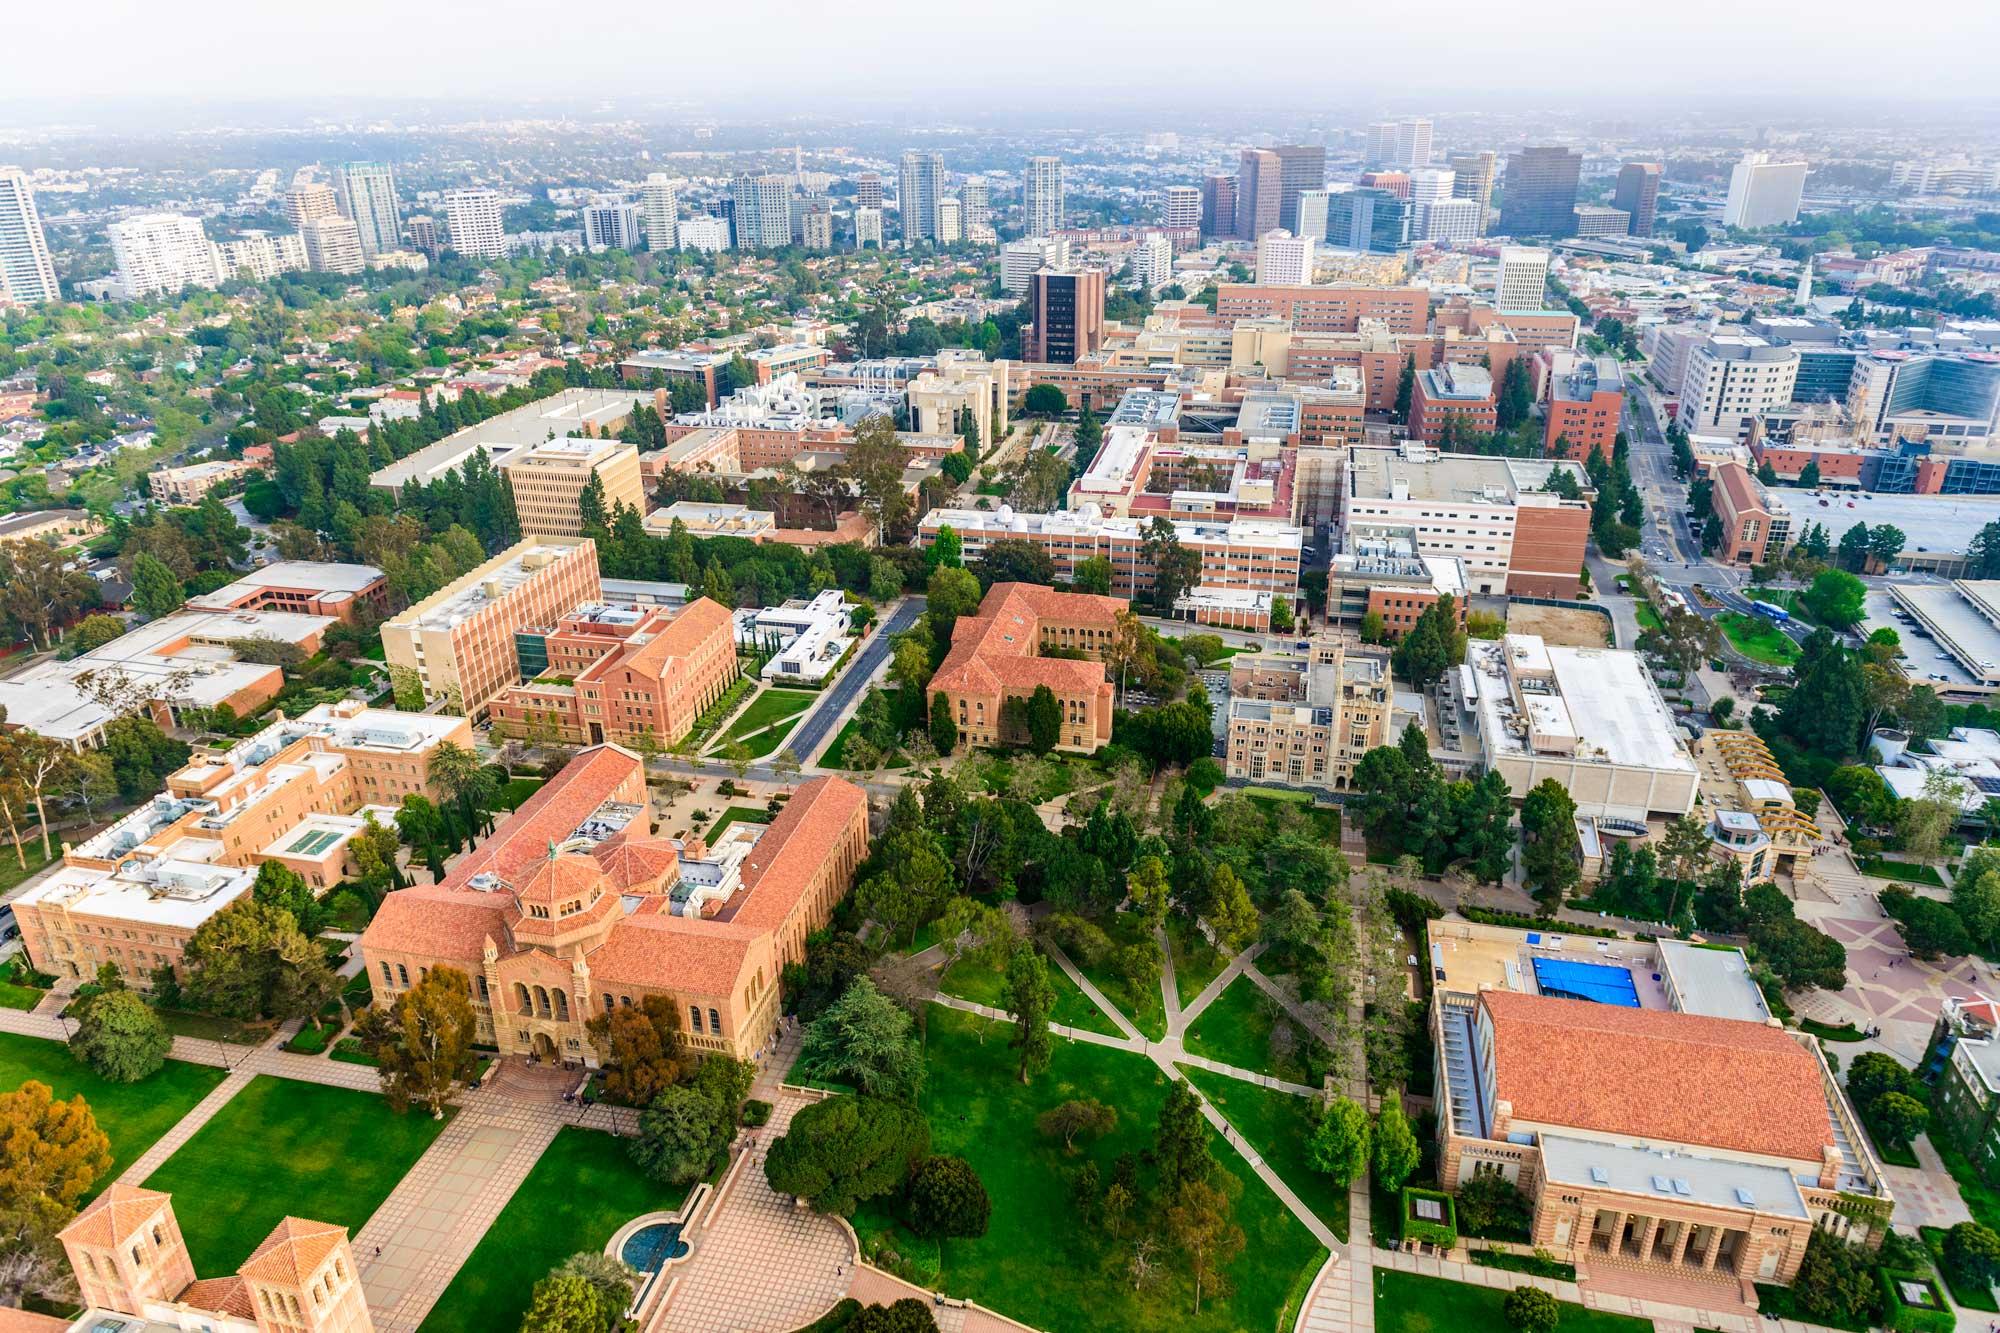 photo - University of California Los Angeles Campus, Aerial View